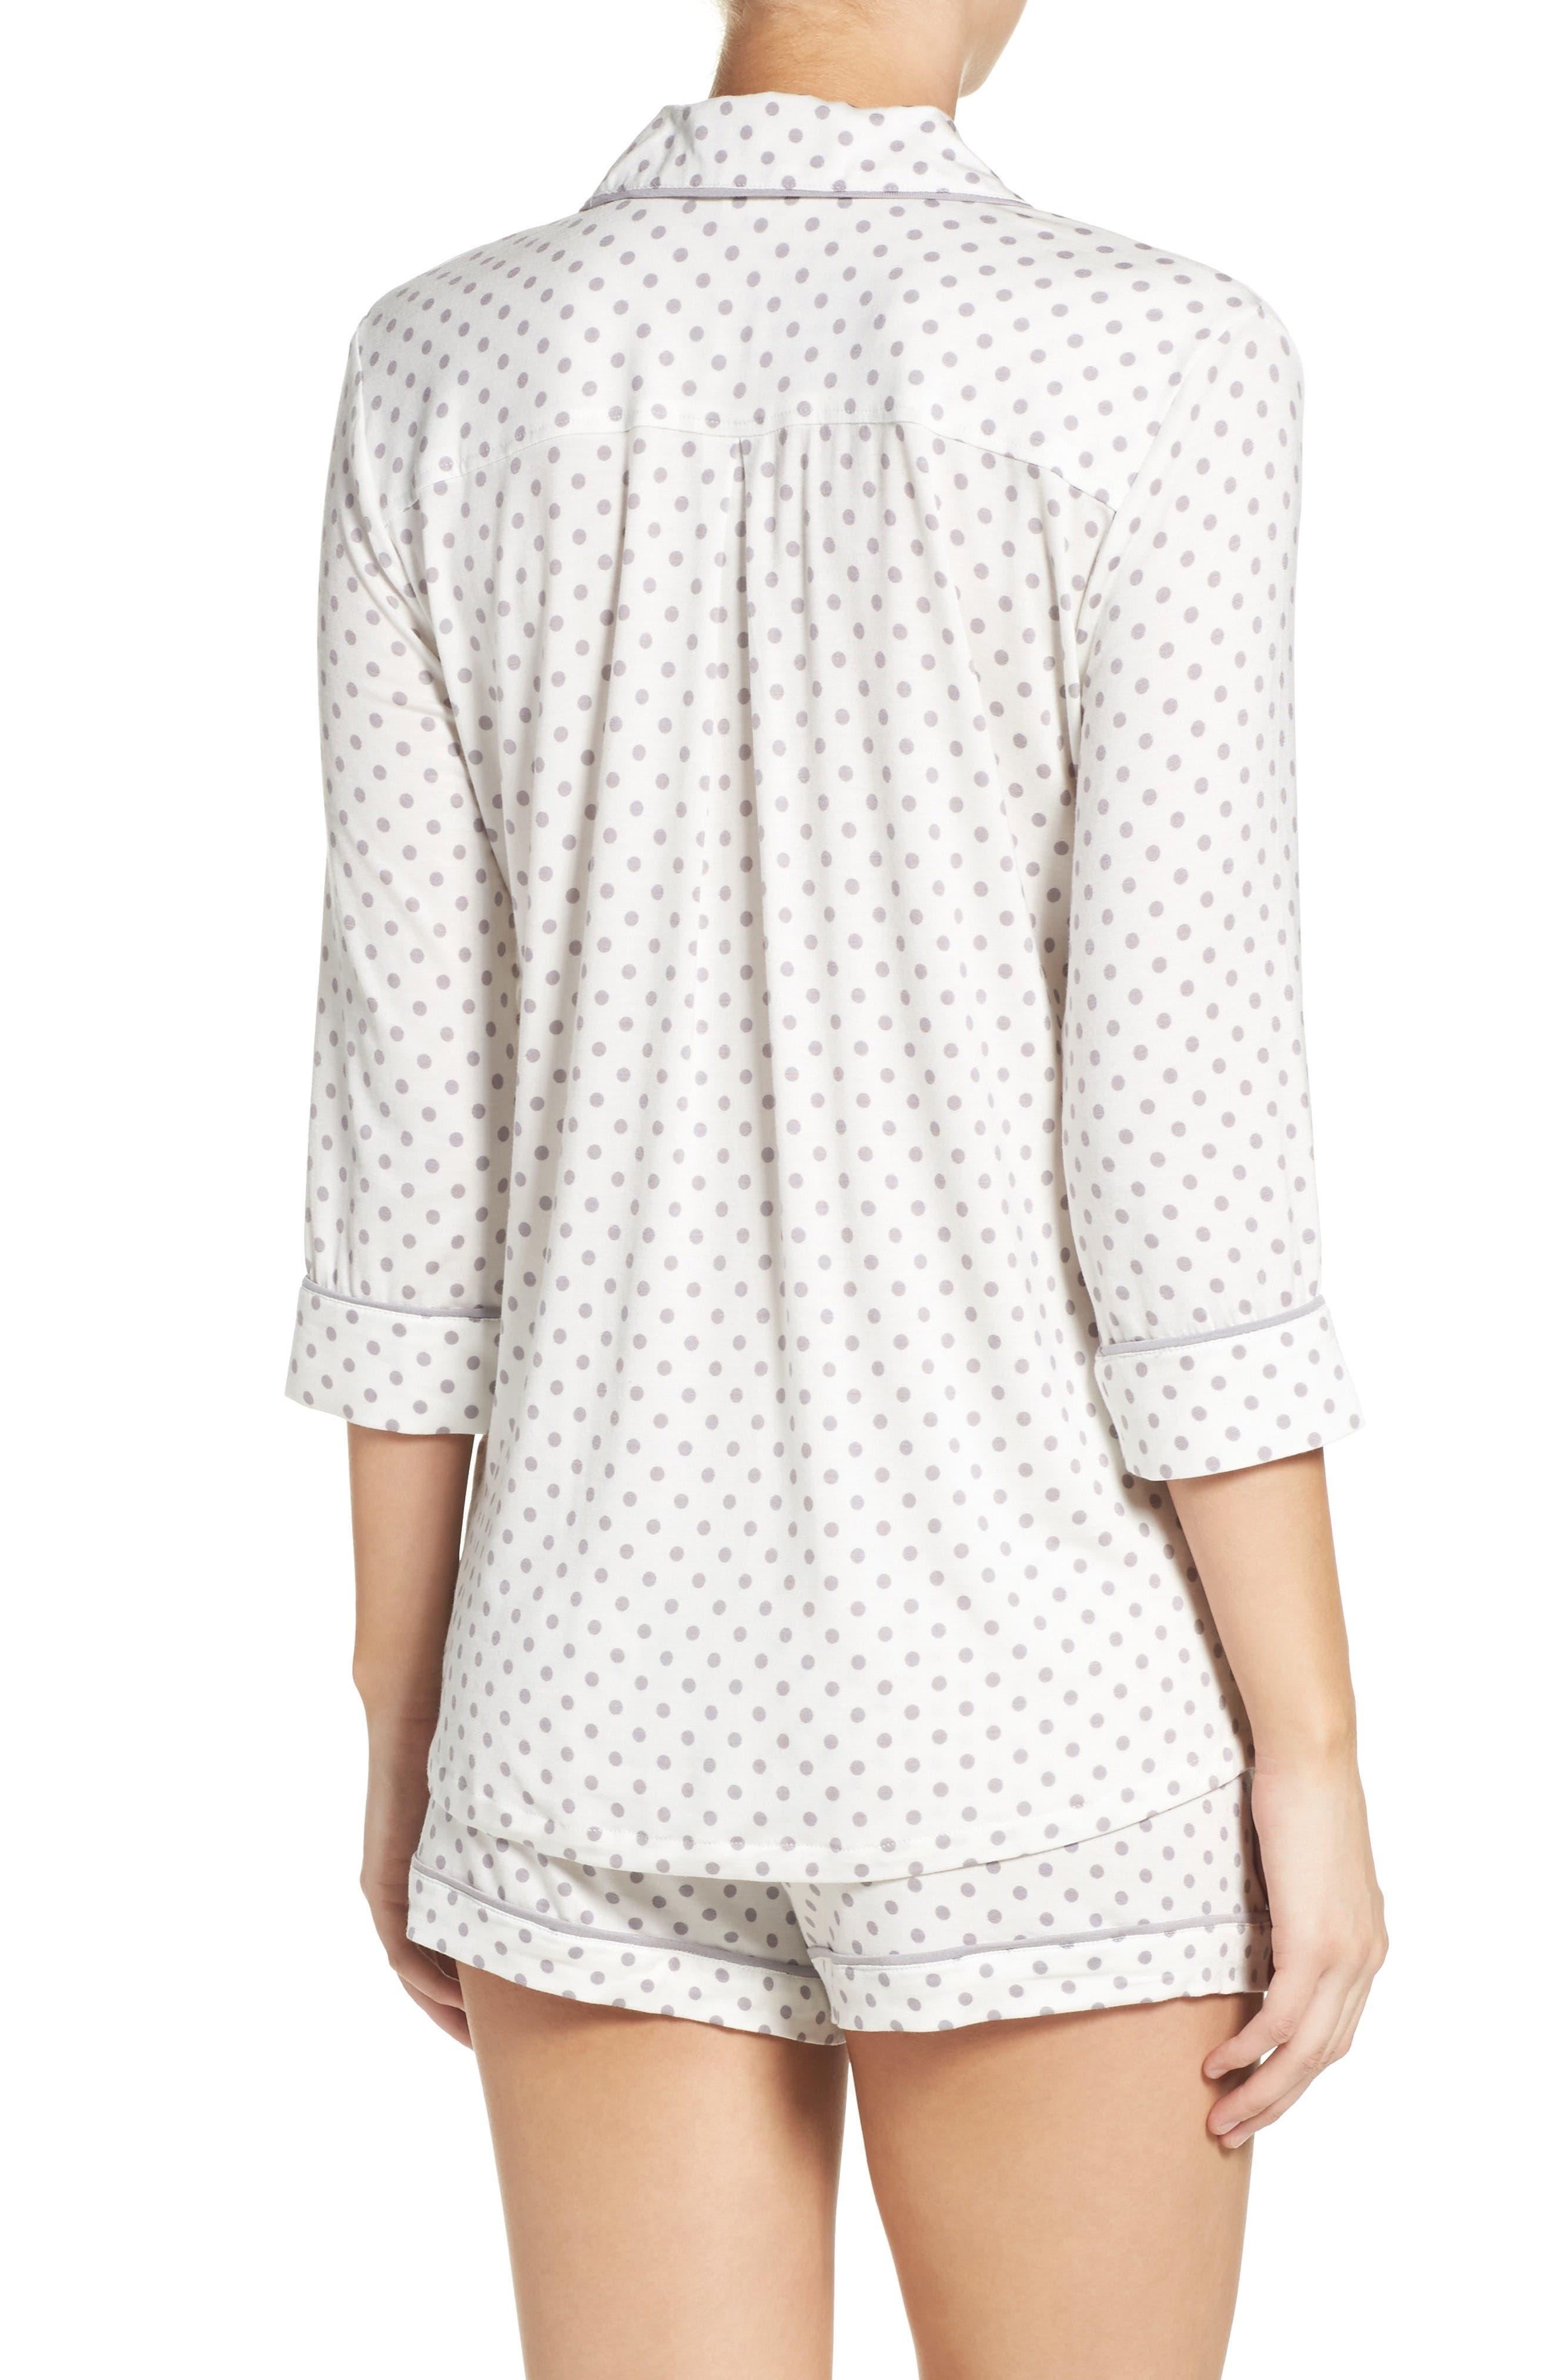 Short Pajamas,                             Alternate thumbnail 2, color,                             900